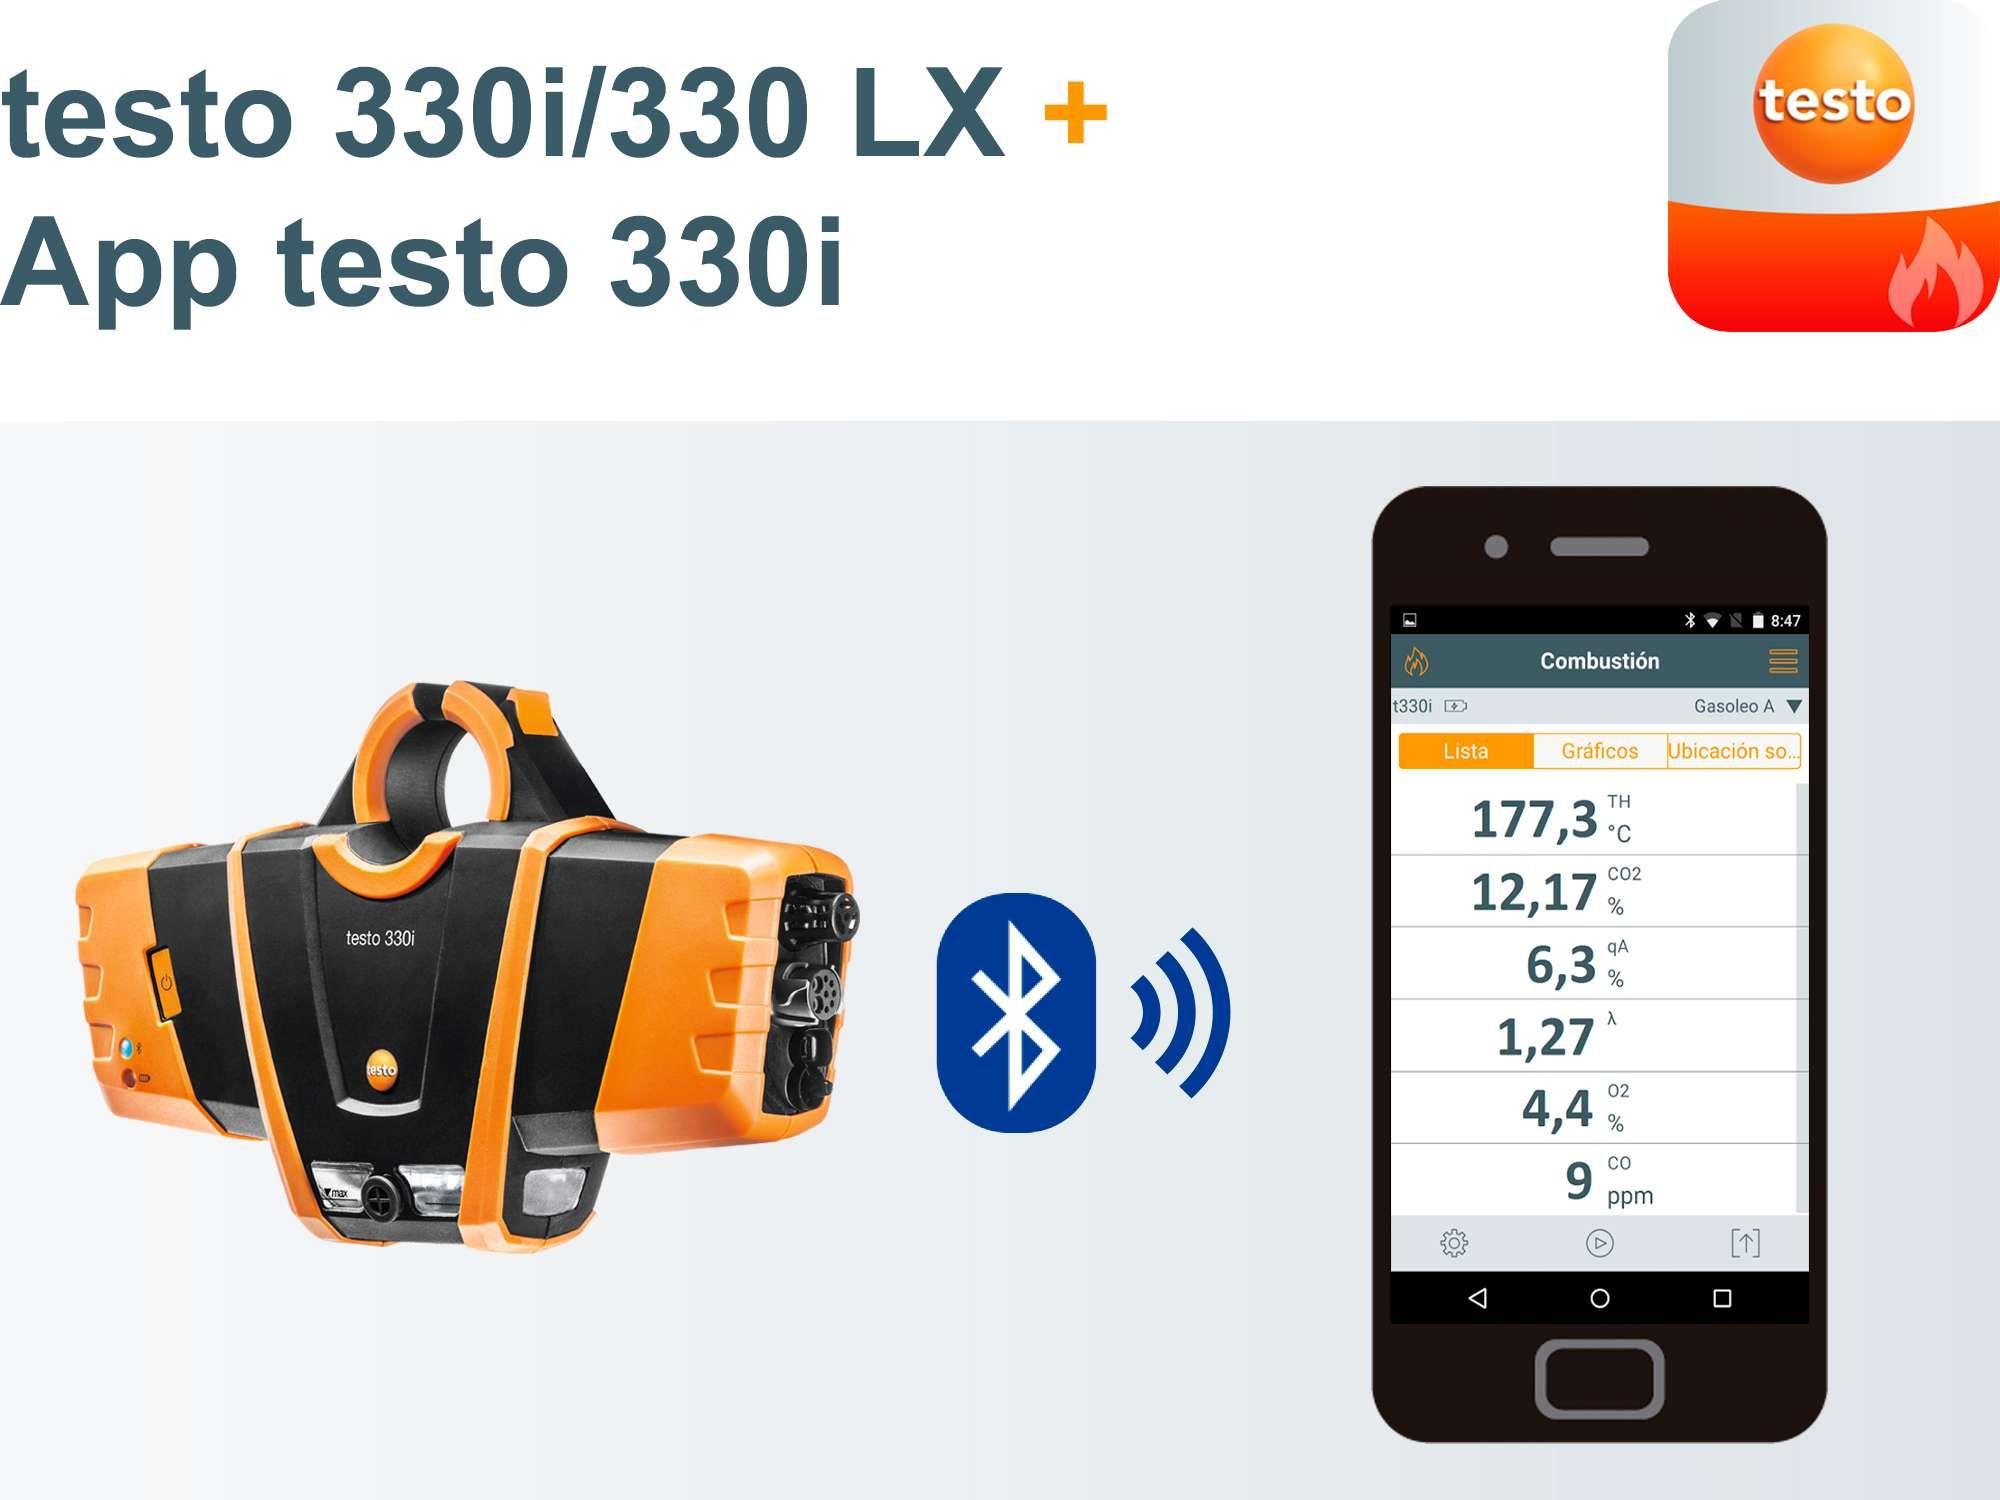 Analizador-combustion-testo-330i